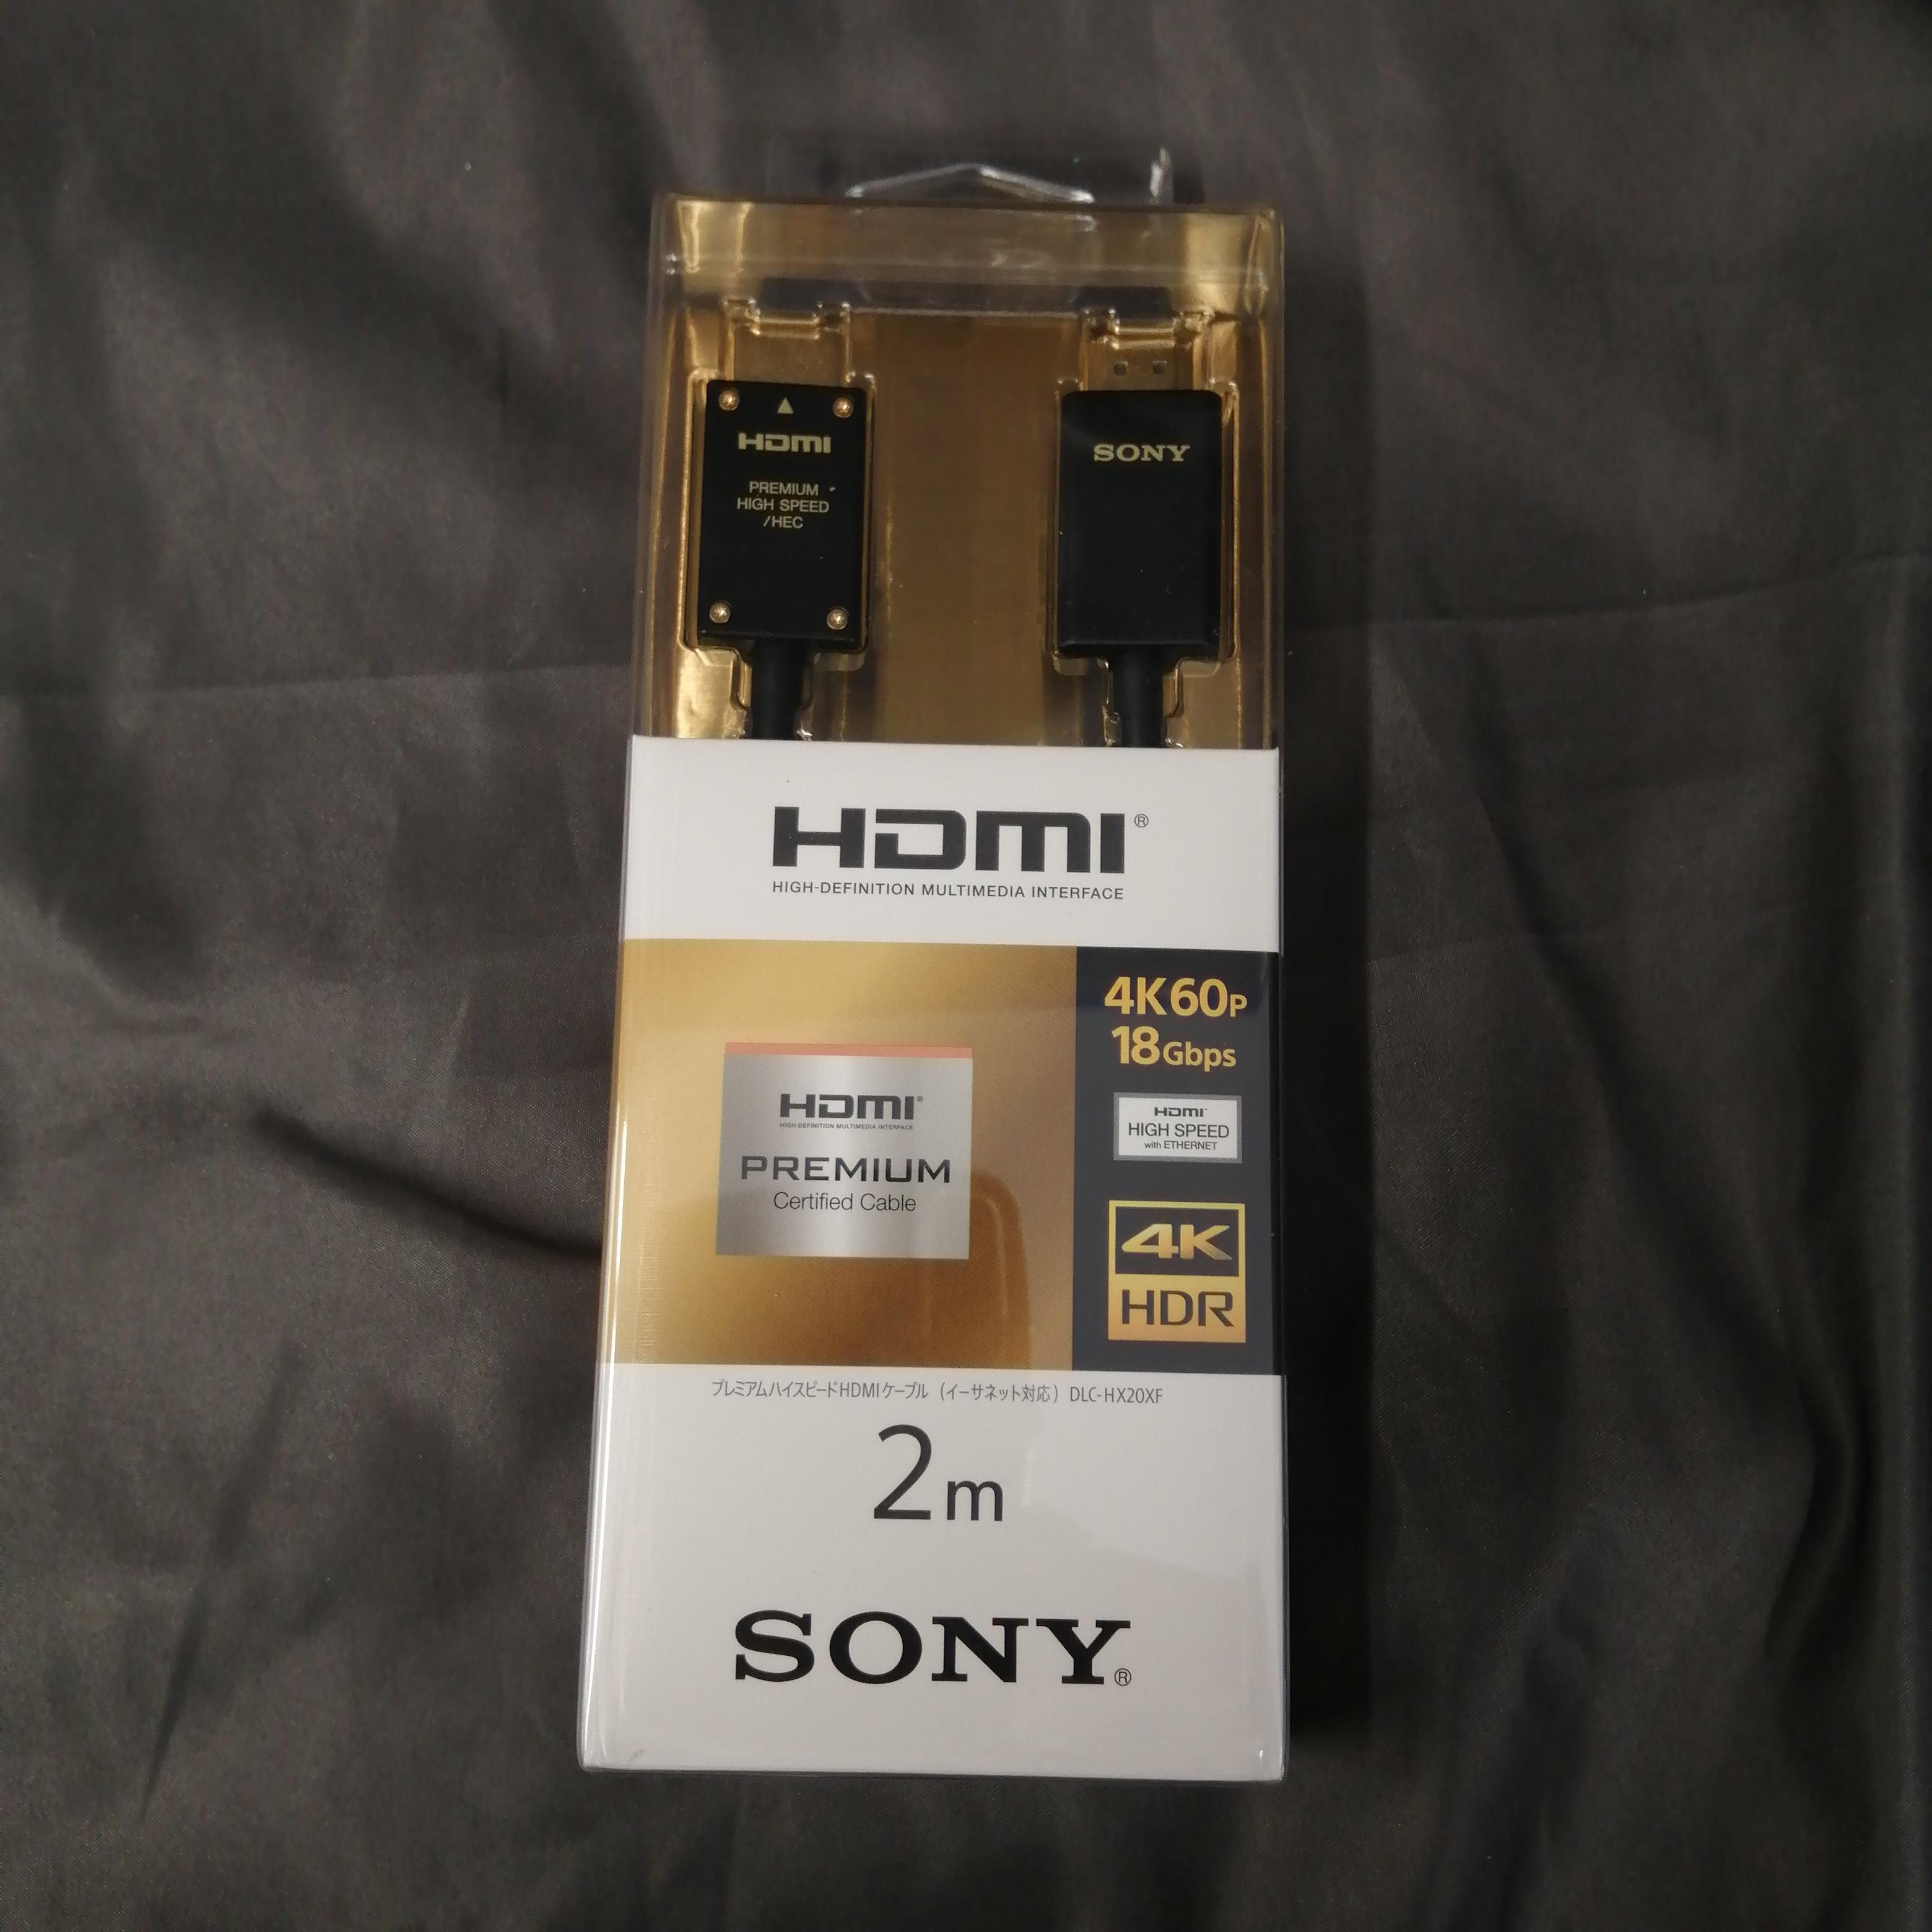 【4K 60P/4K HDR映像に対応 2m】 SONY